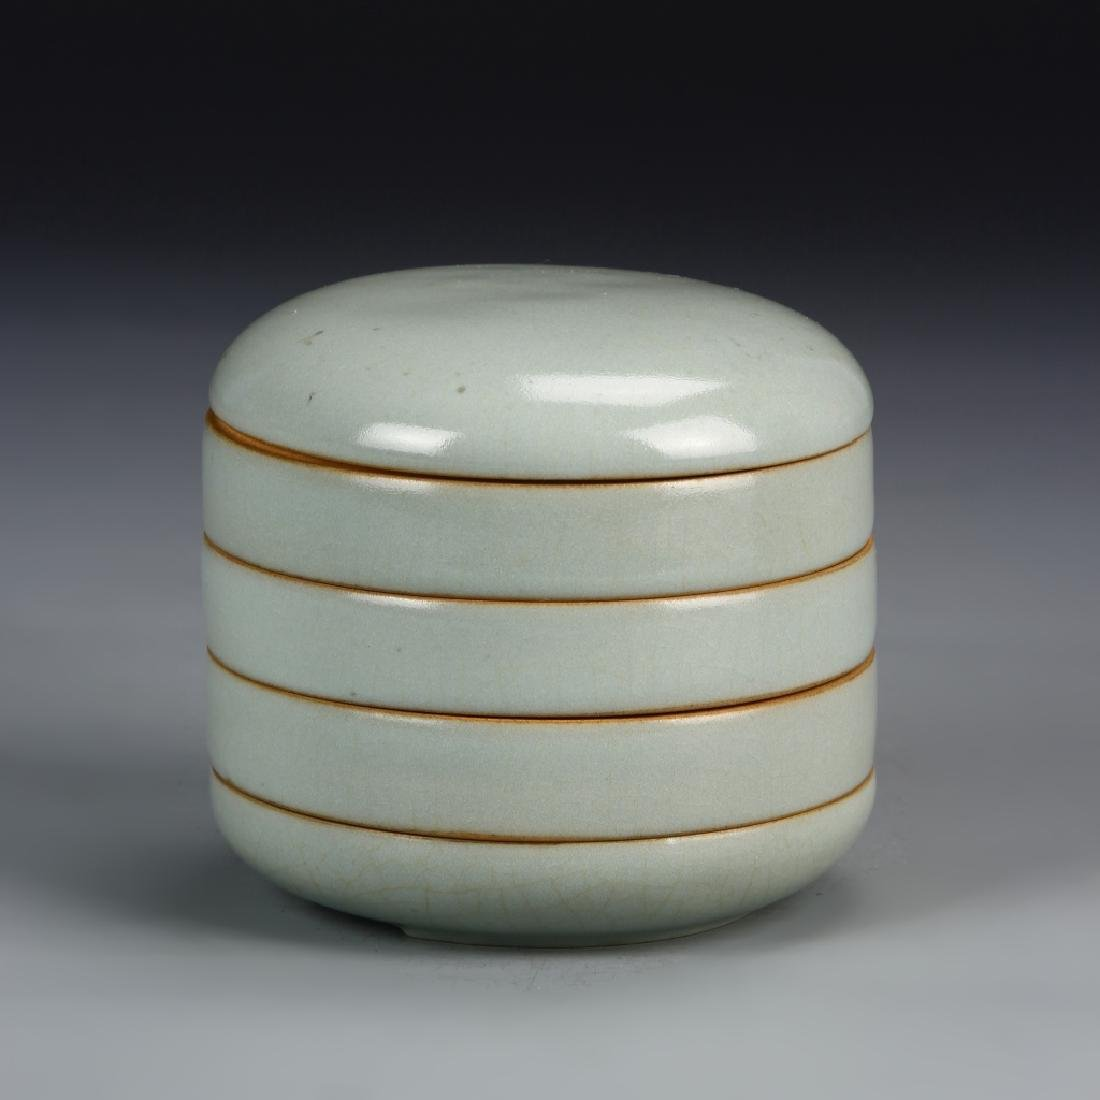 Chinese Antique Ruyao Make-up Stacking Box